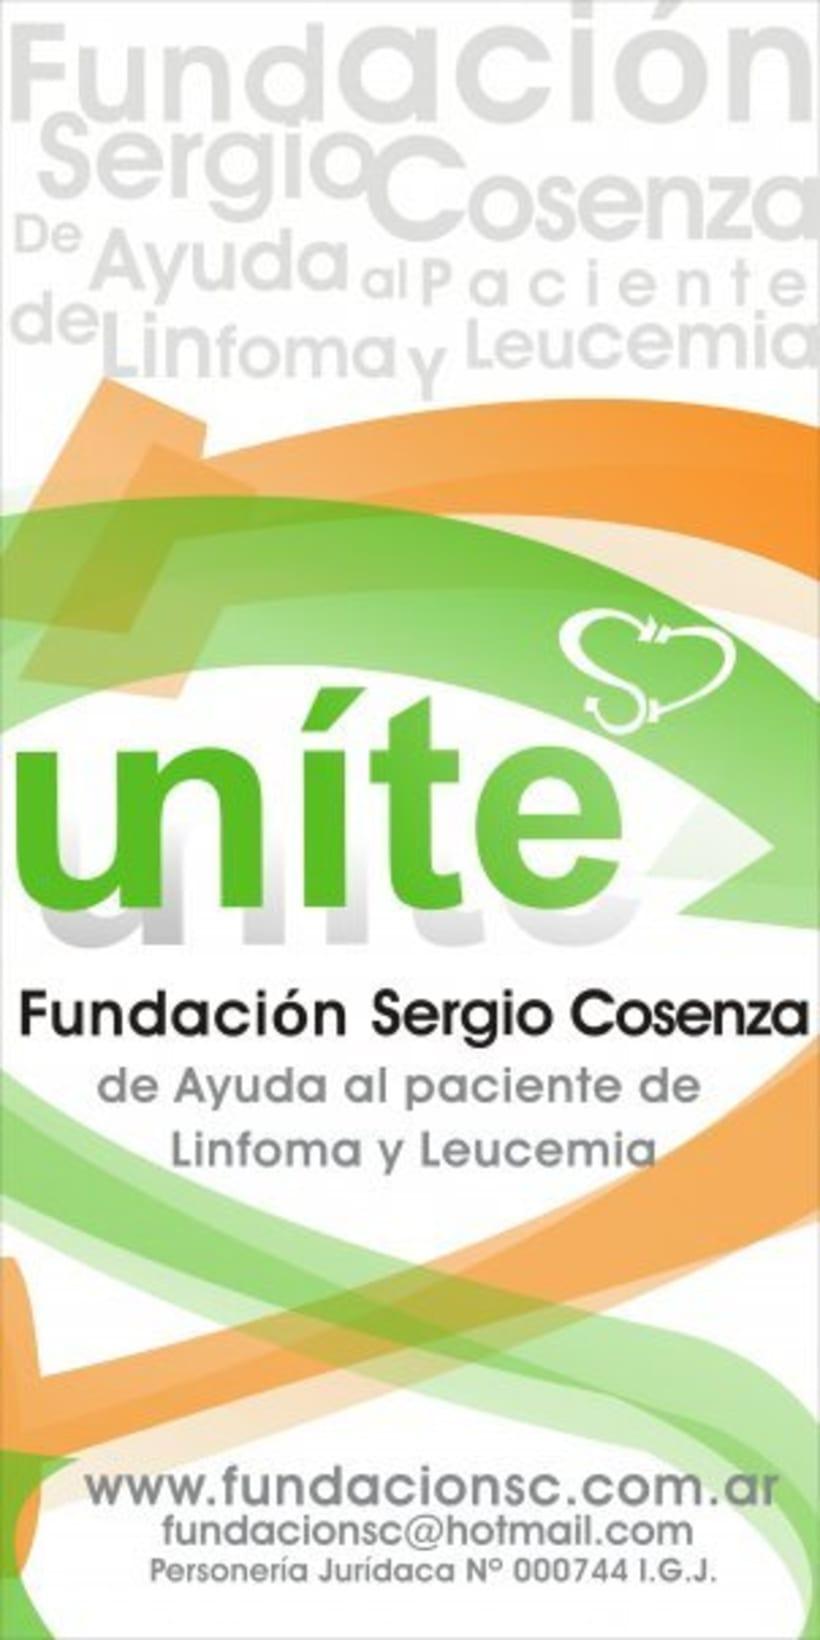 Campaña Fundacion Sergio Cosenza 0